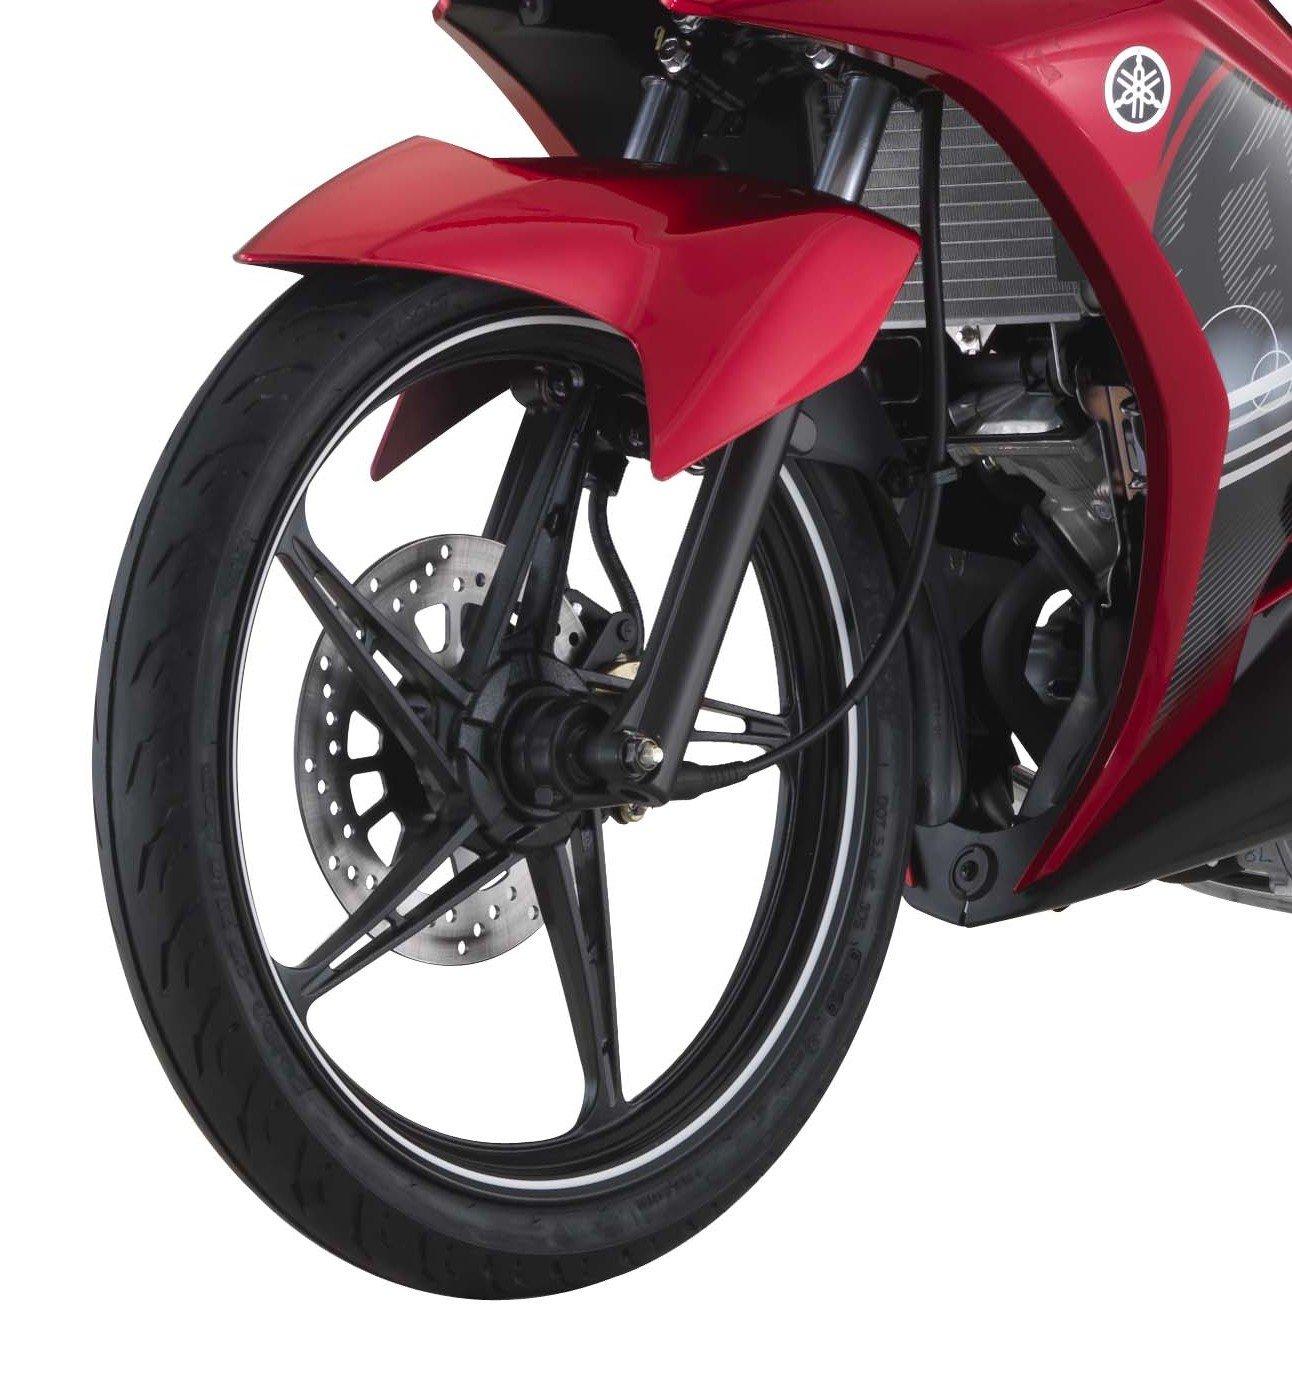 Yamaha Fprice